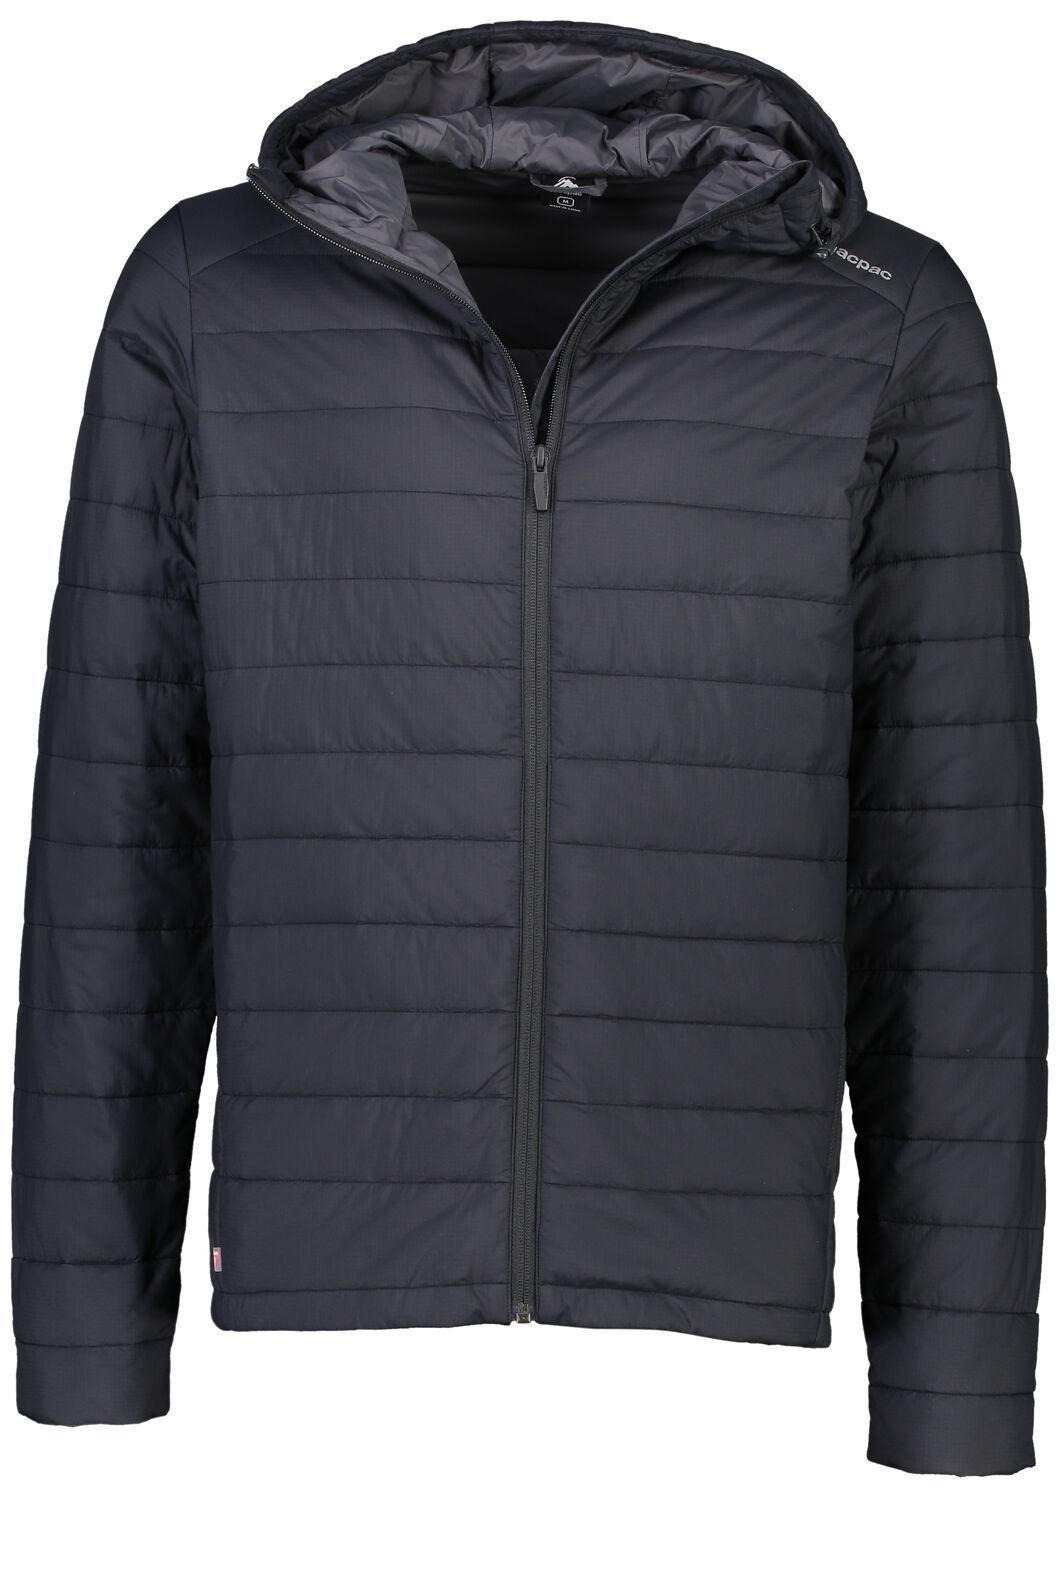 Macpac ETA PrimaLoft® Jacket - Men's, Black, hi-res